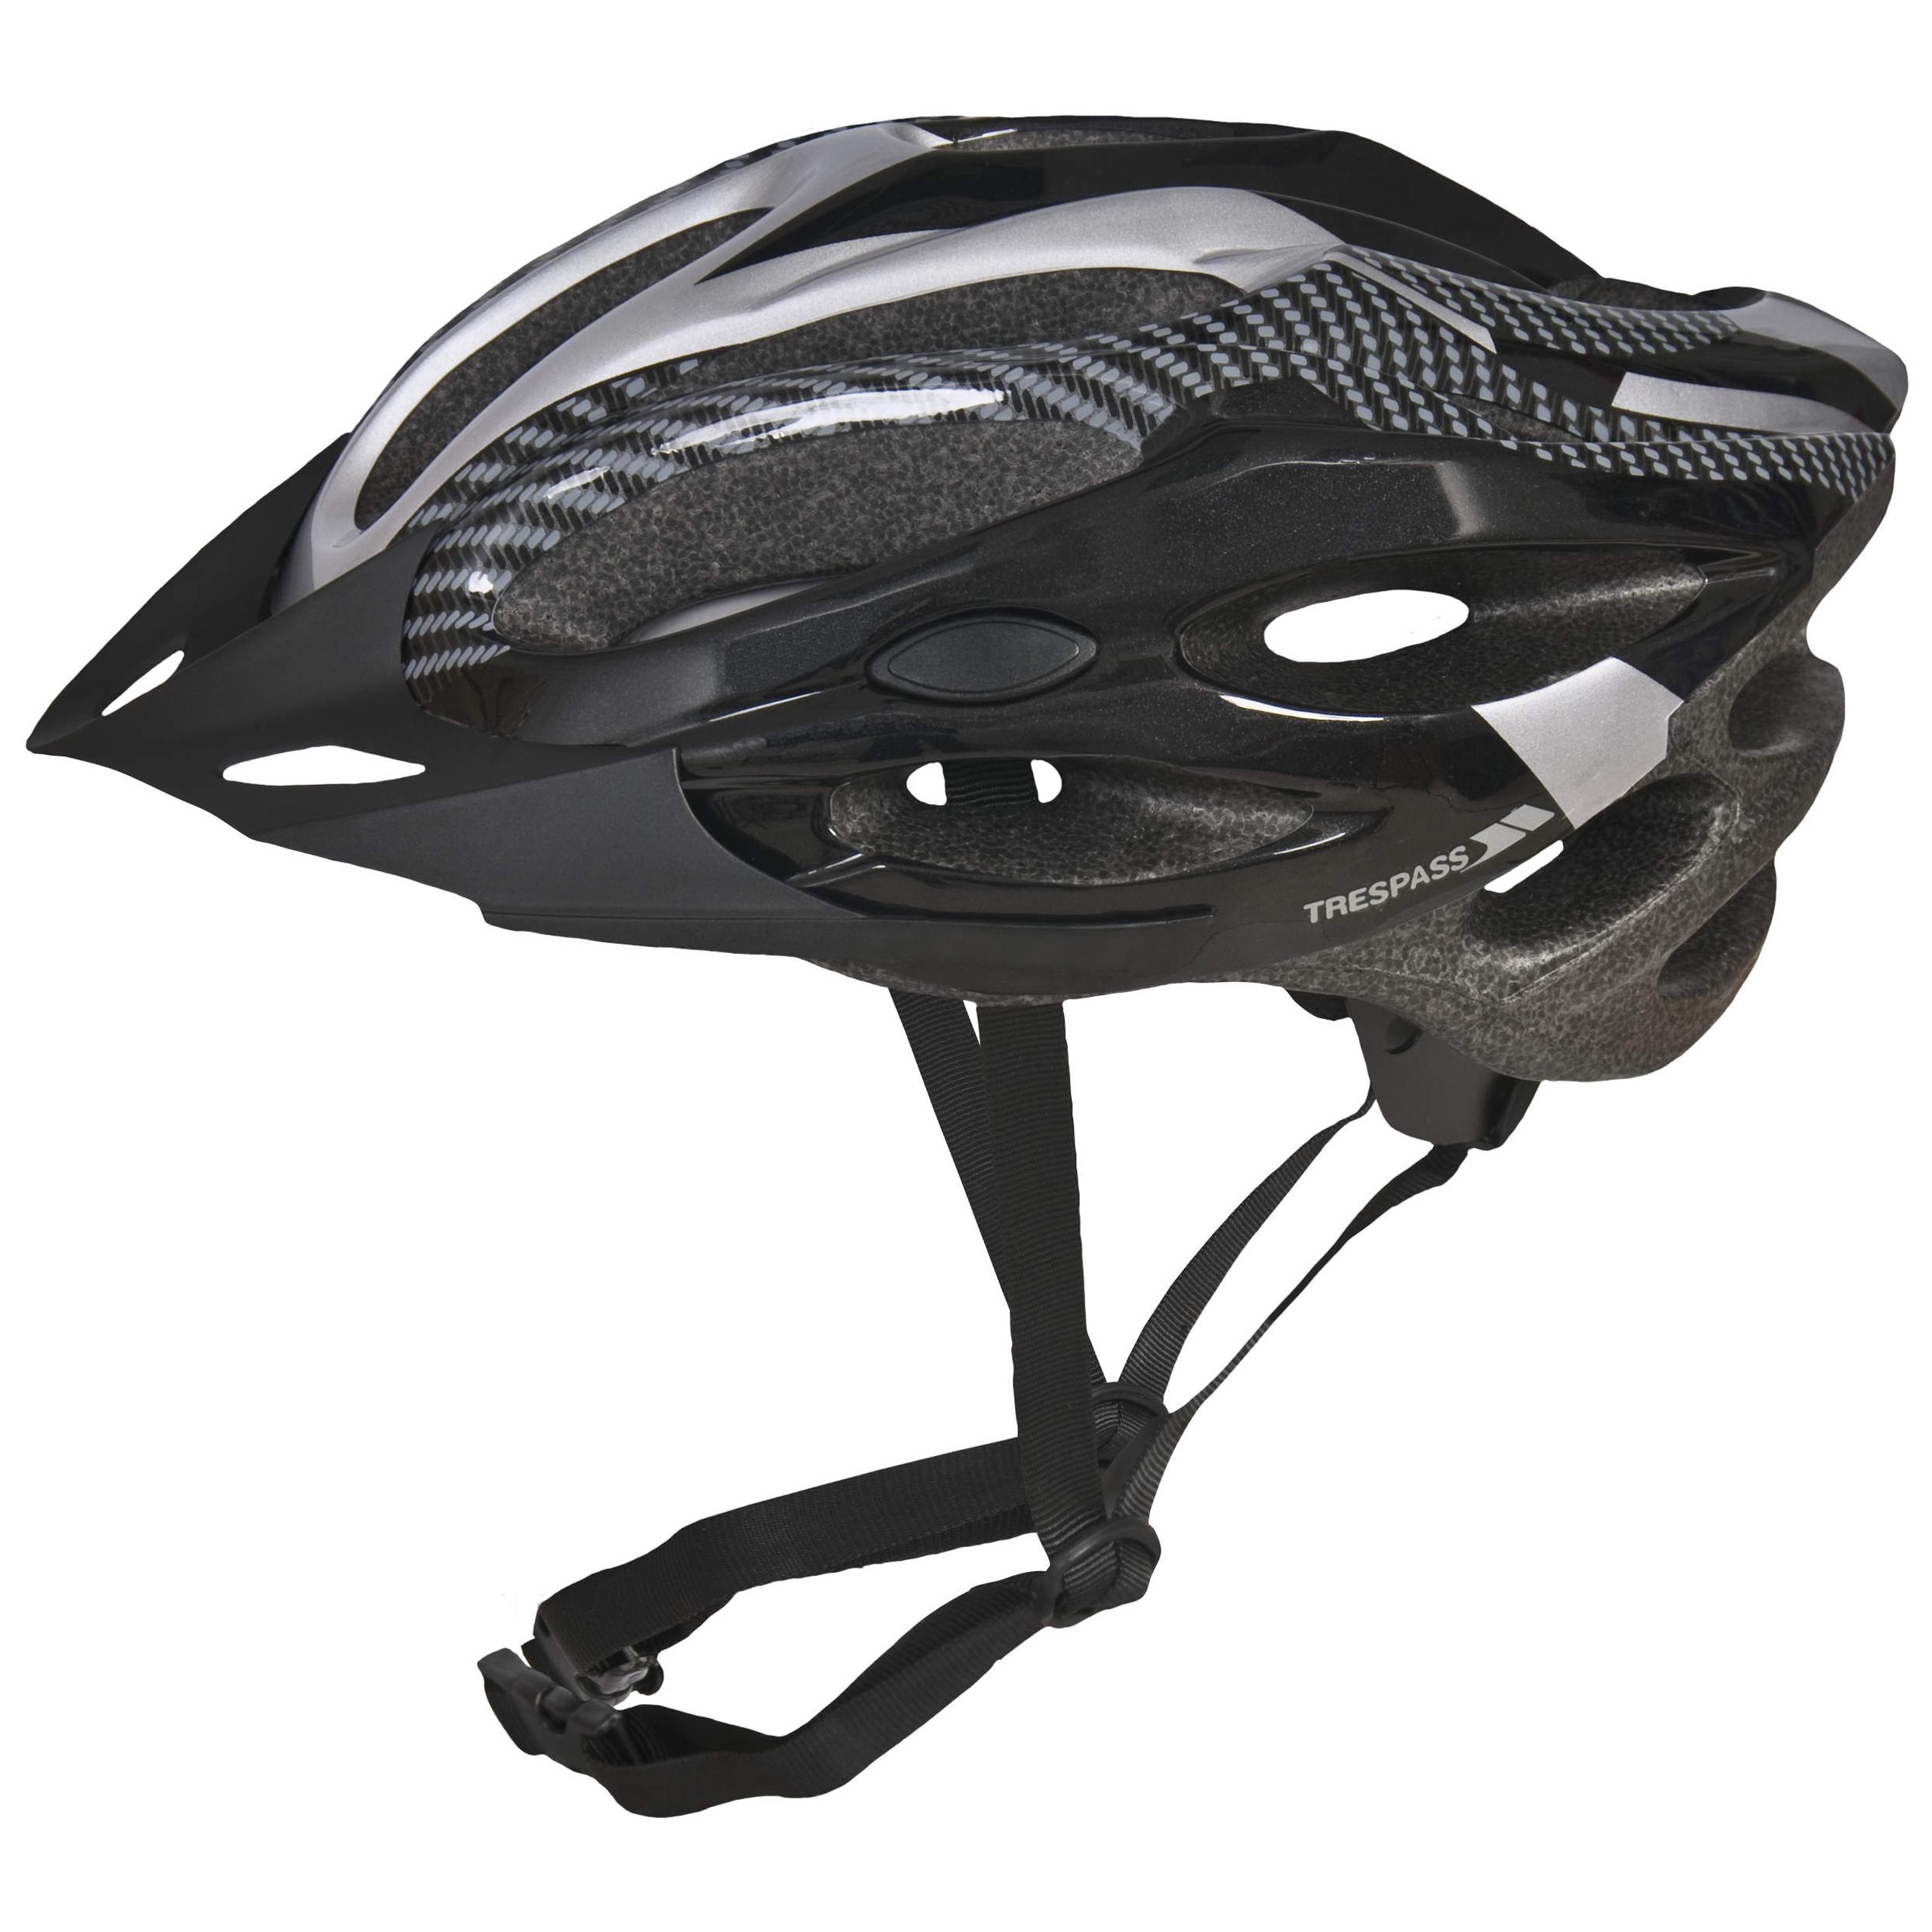 Trespass-Crankster-Adults-Cycling-Bike-Helmet-Lightweight-in-Black-White-Red thumbnail 14